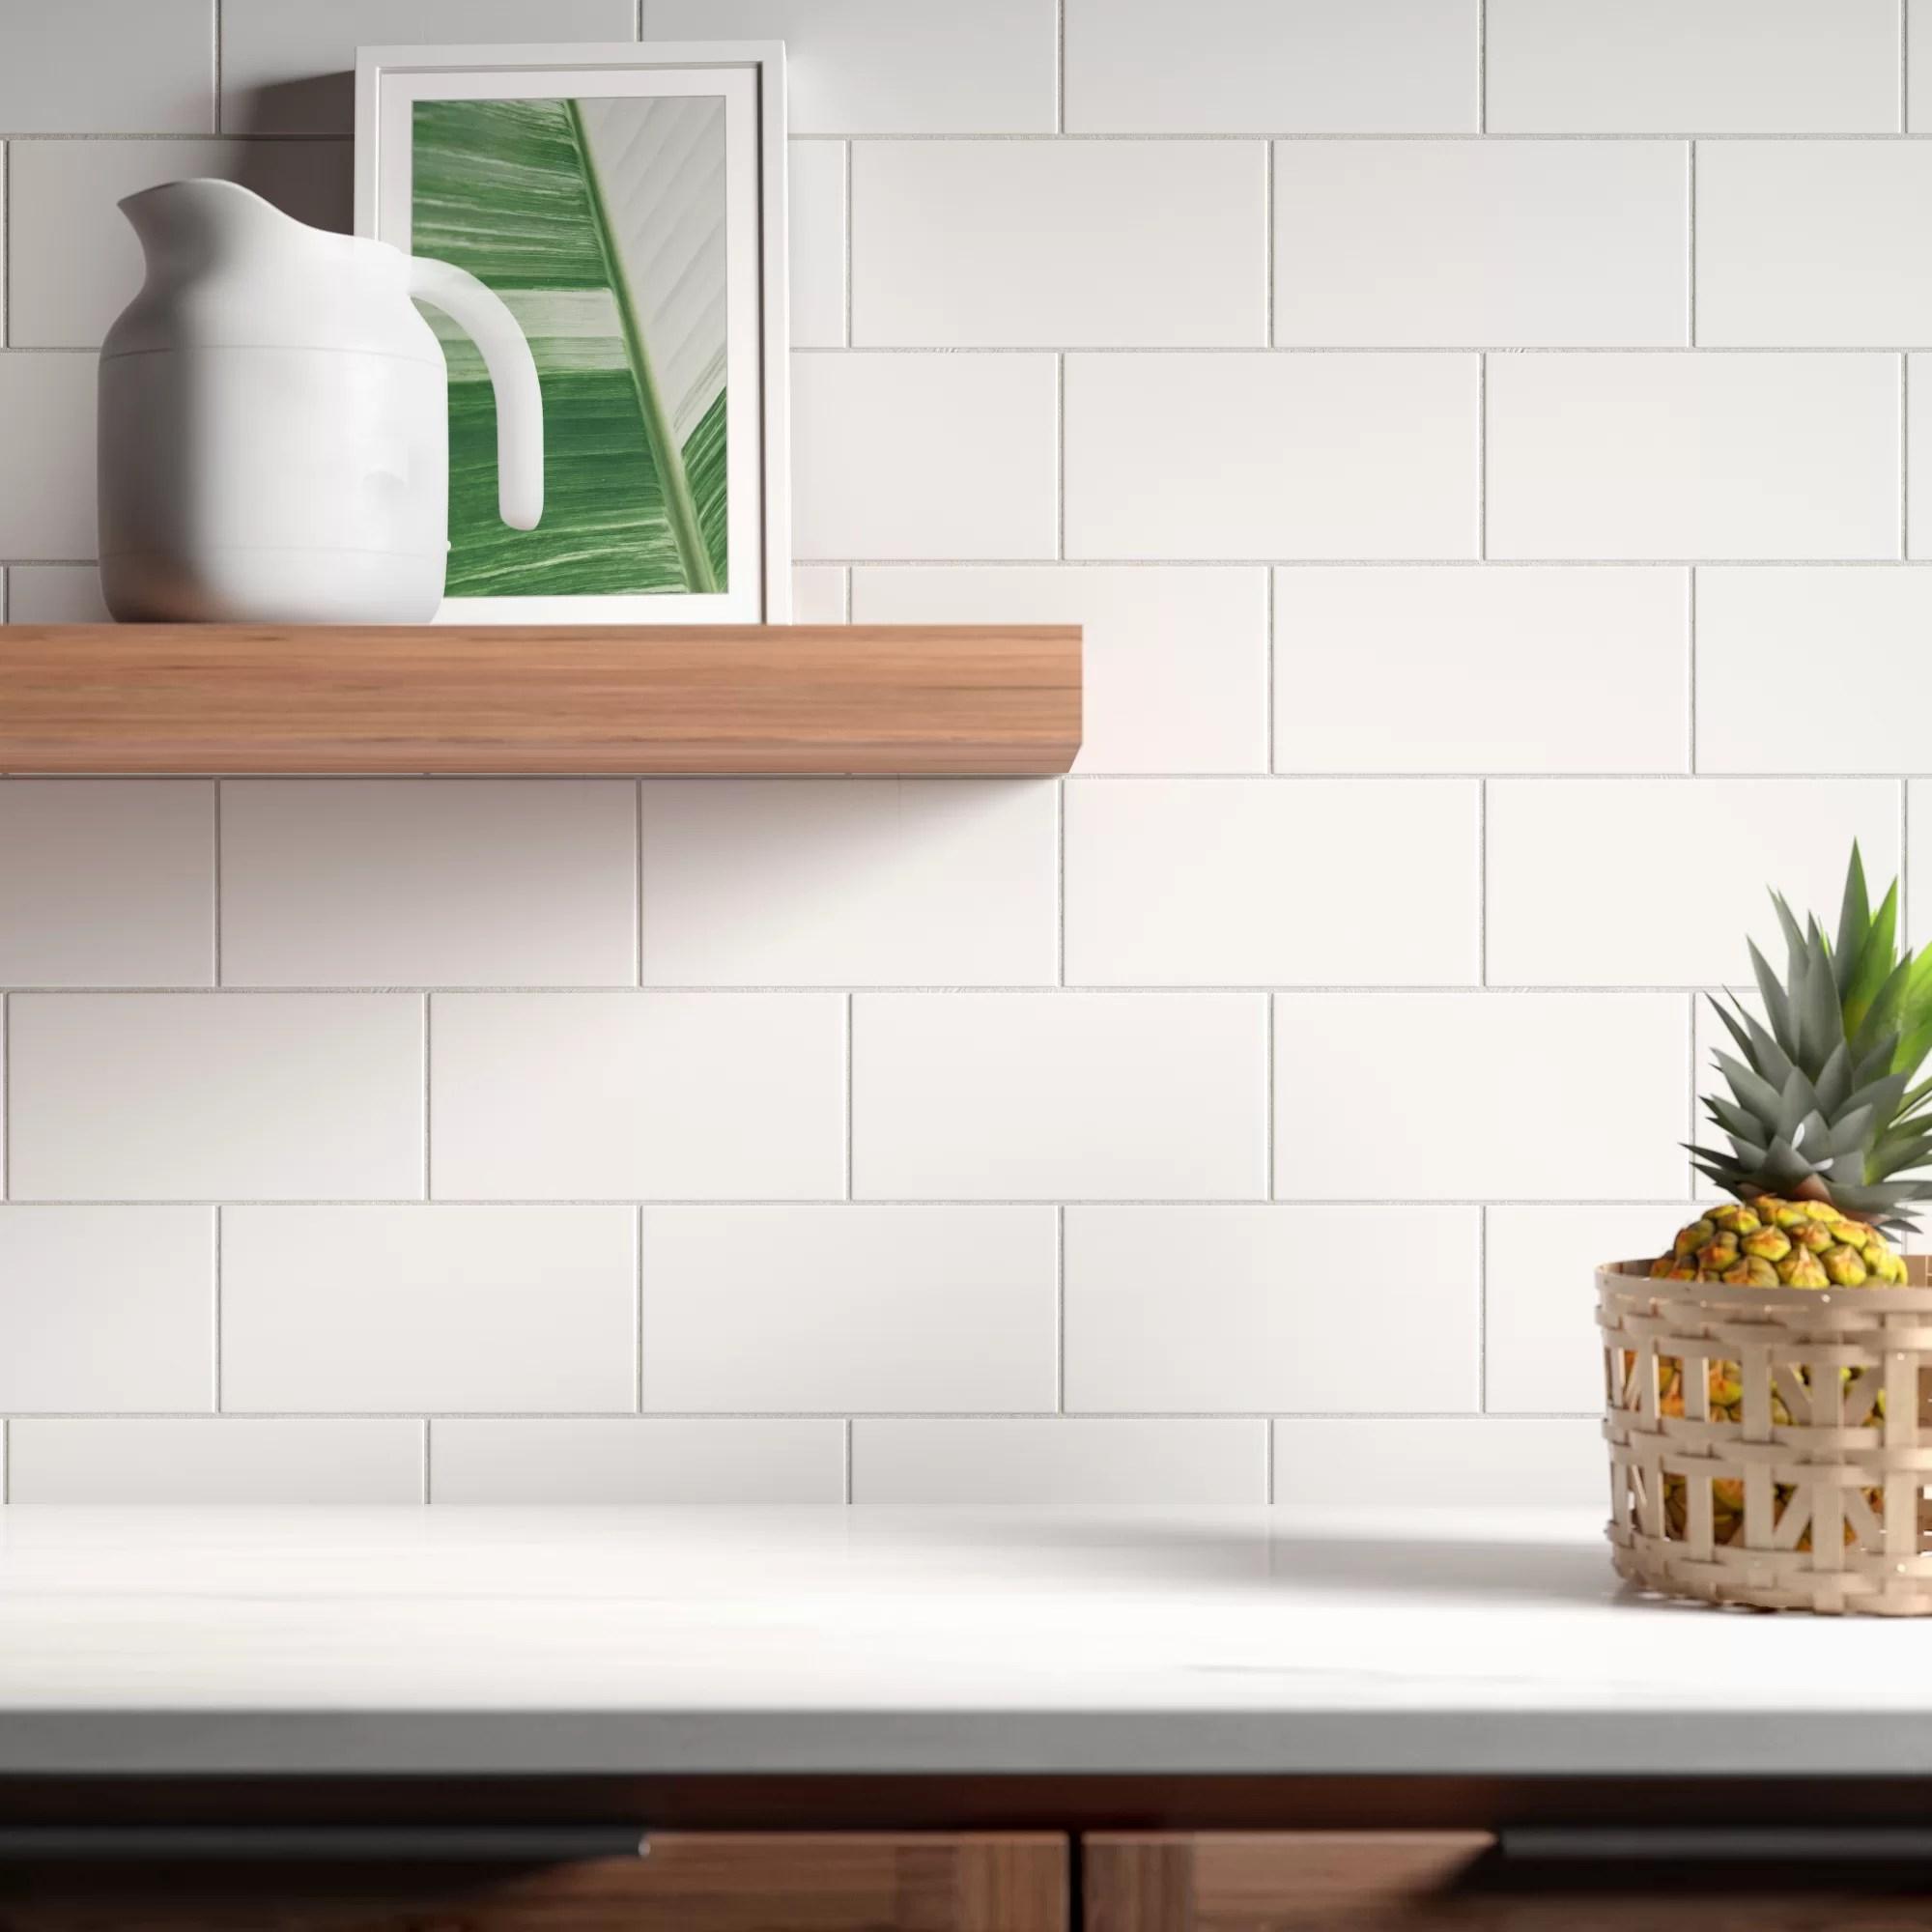 casden 4 x 8 ceramic subway tile